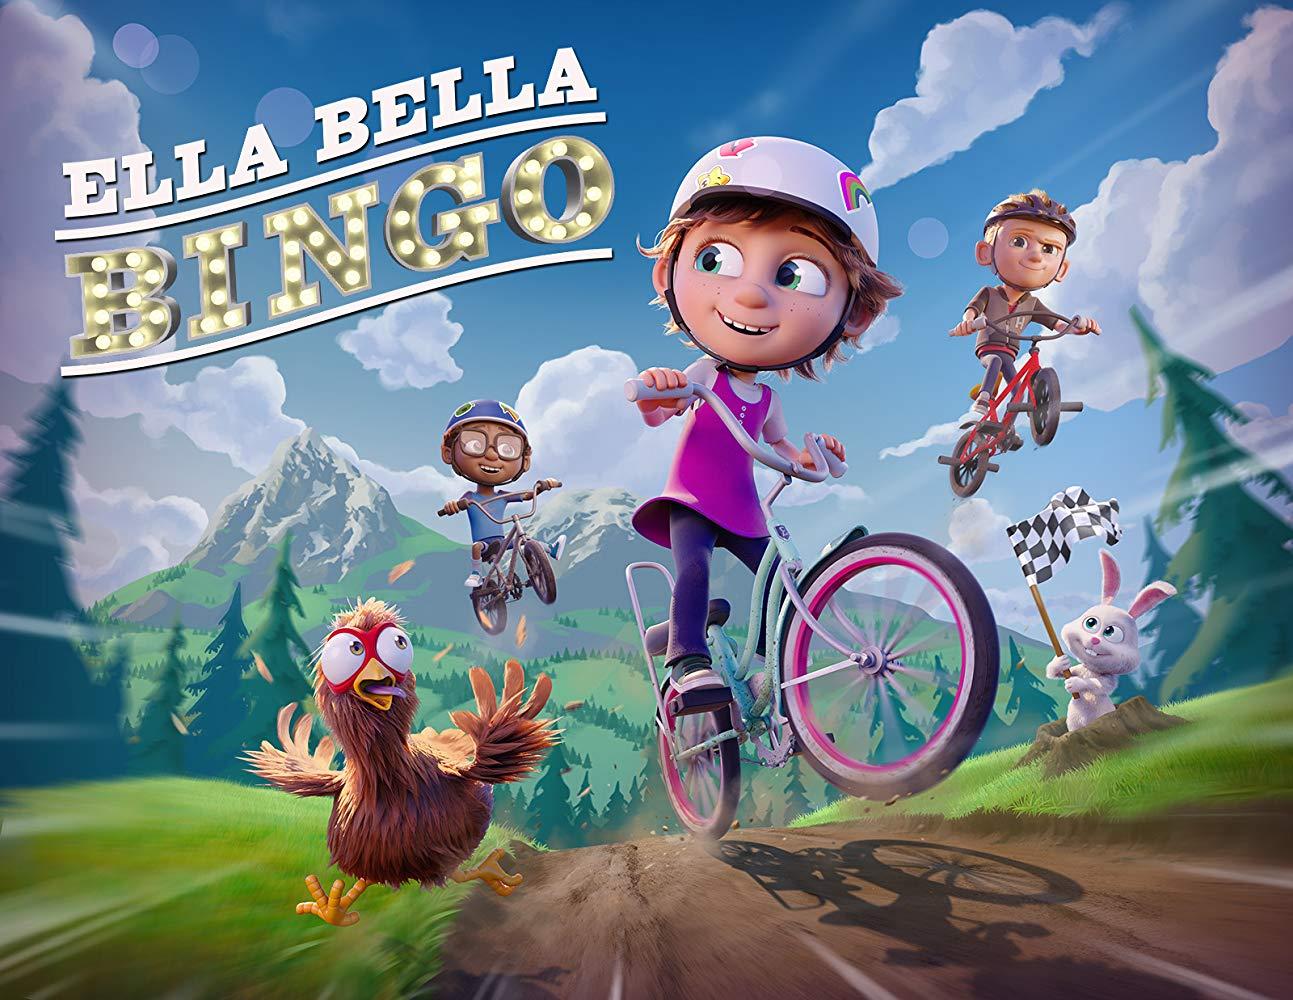 Ella Bella Bingo (2020) Film Online Subtitrat